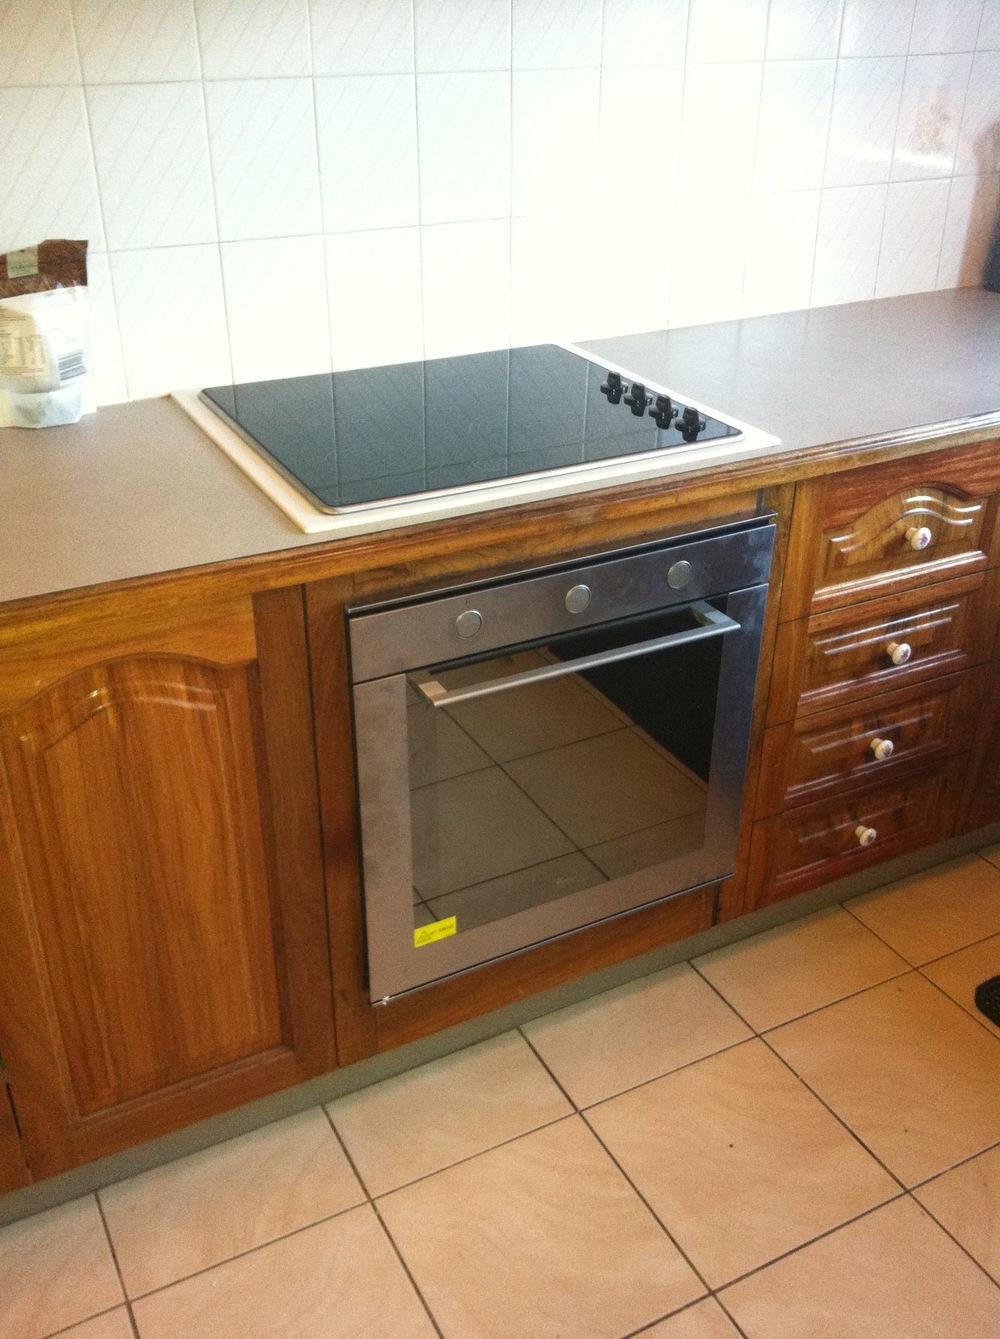 Kitchen appliance installations and maintenance